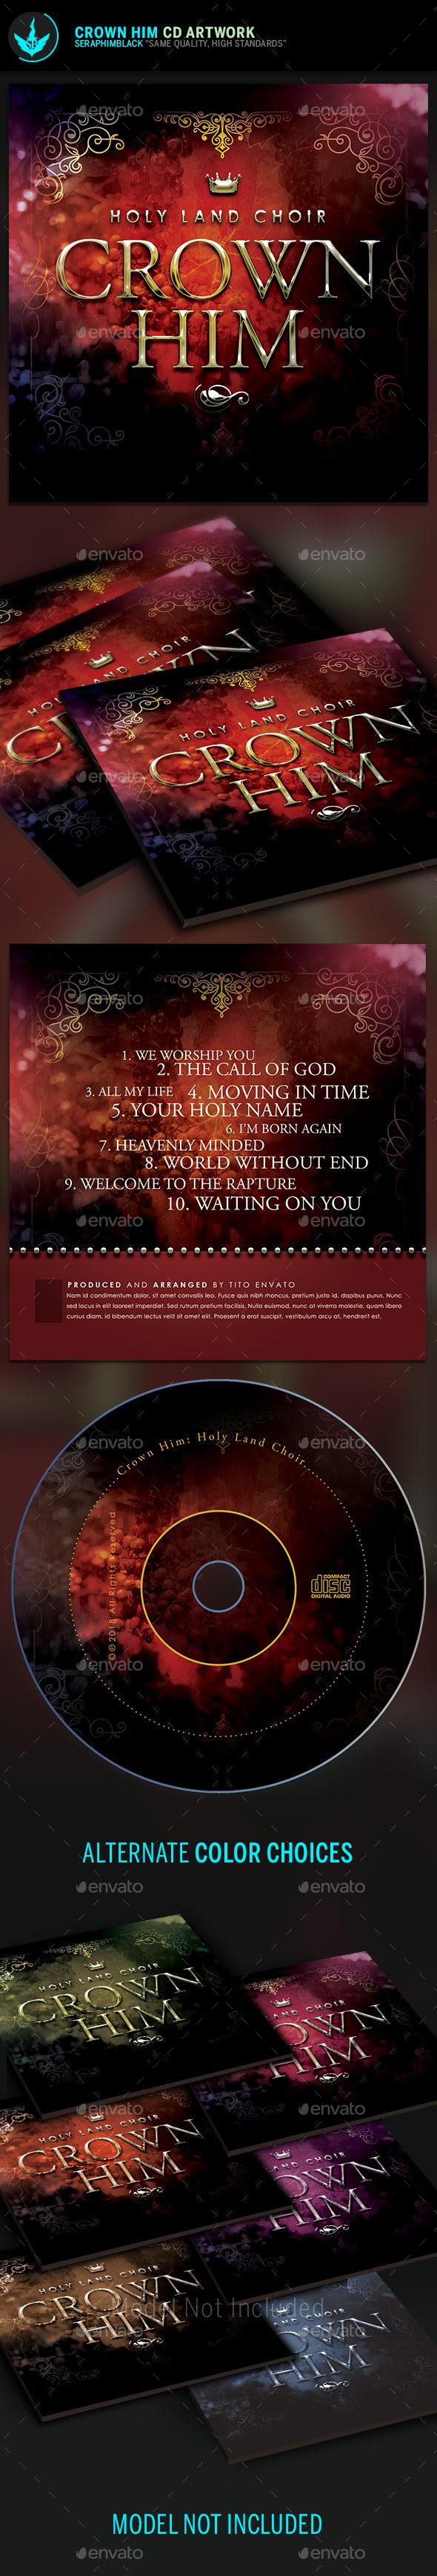 Royal CD Artwork Template - CD & DVD Artwork Print Templates